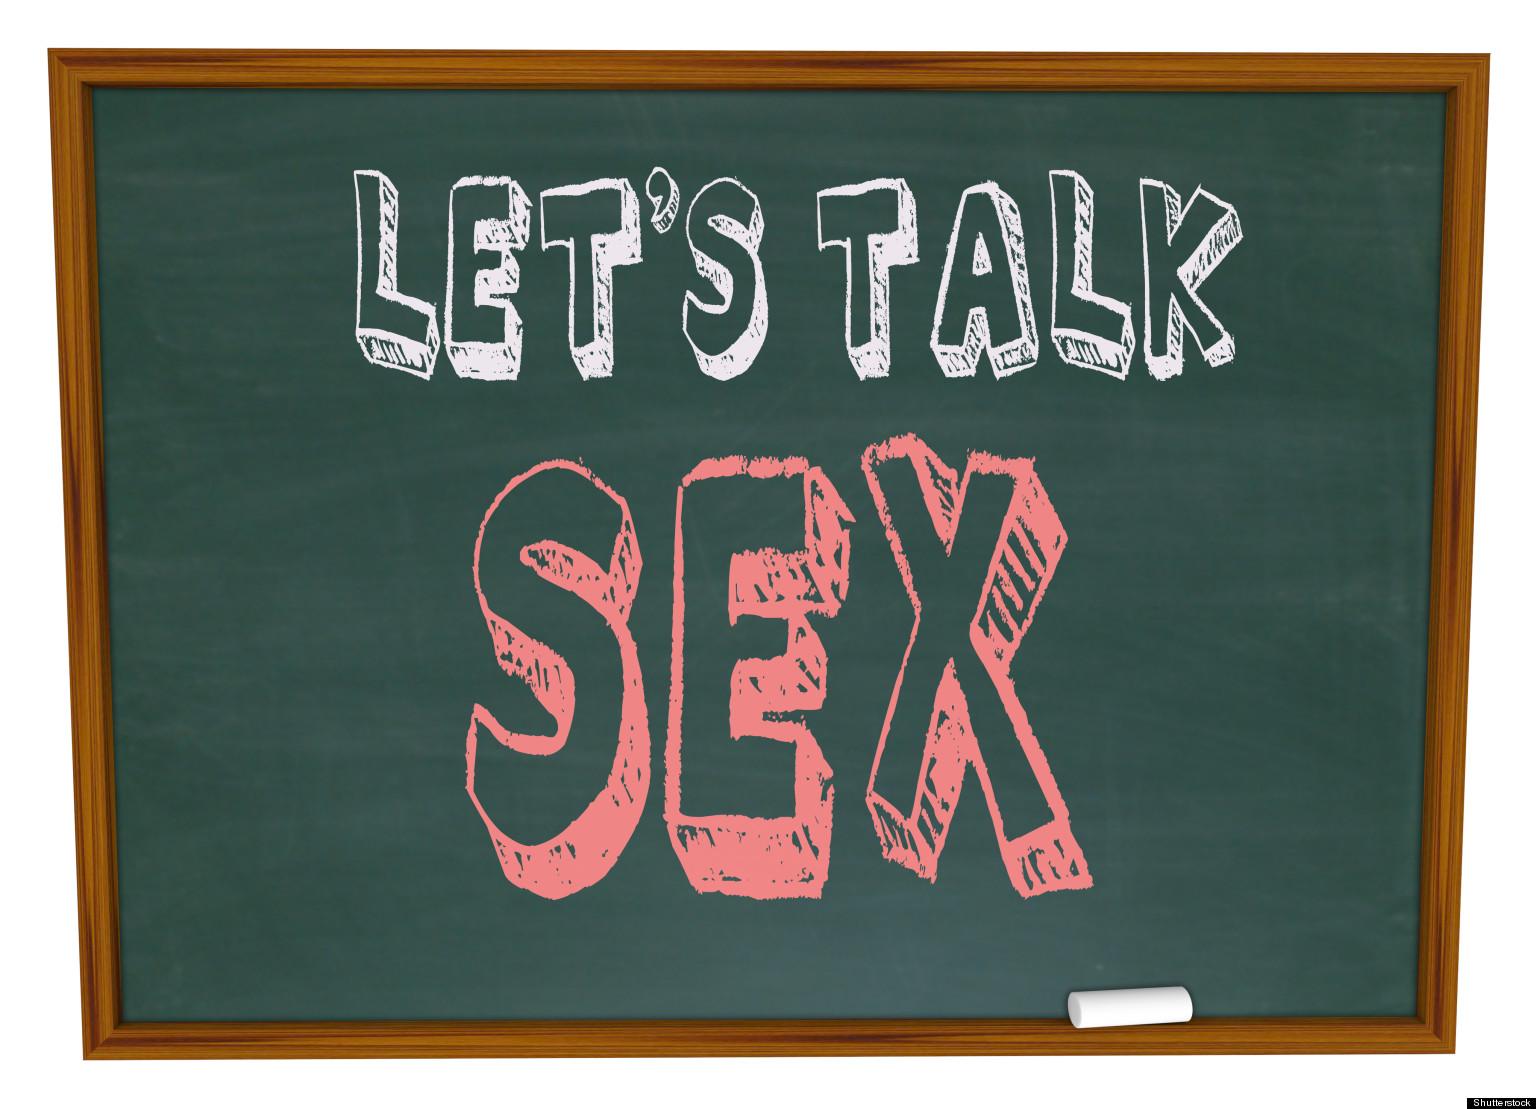 W w w sex ed com